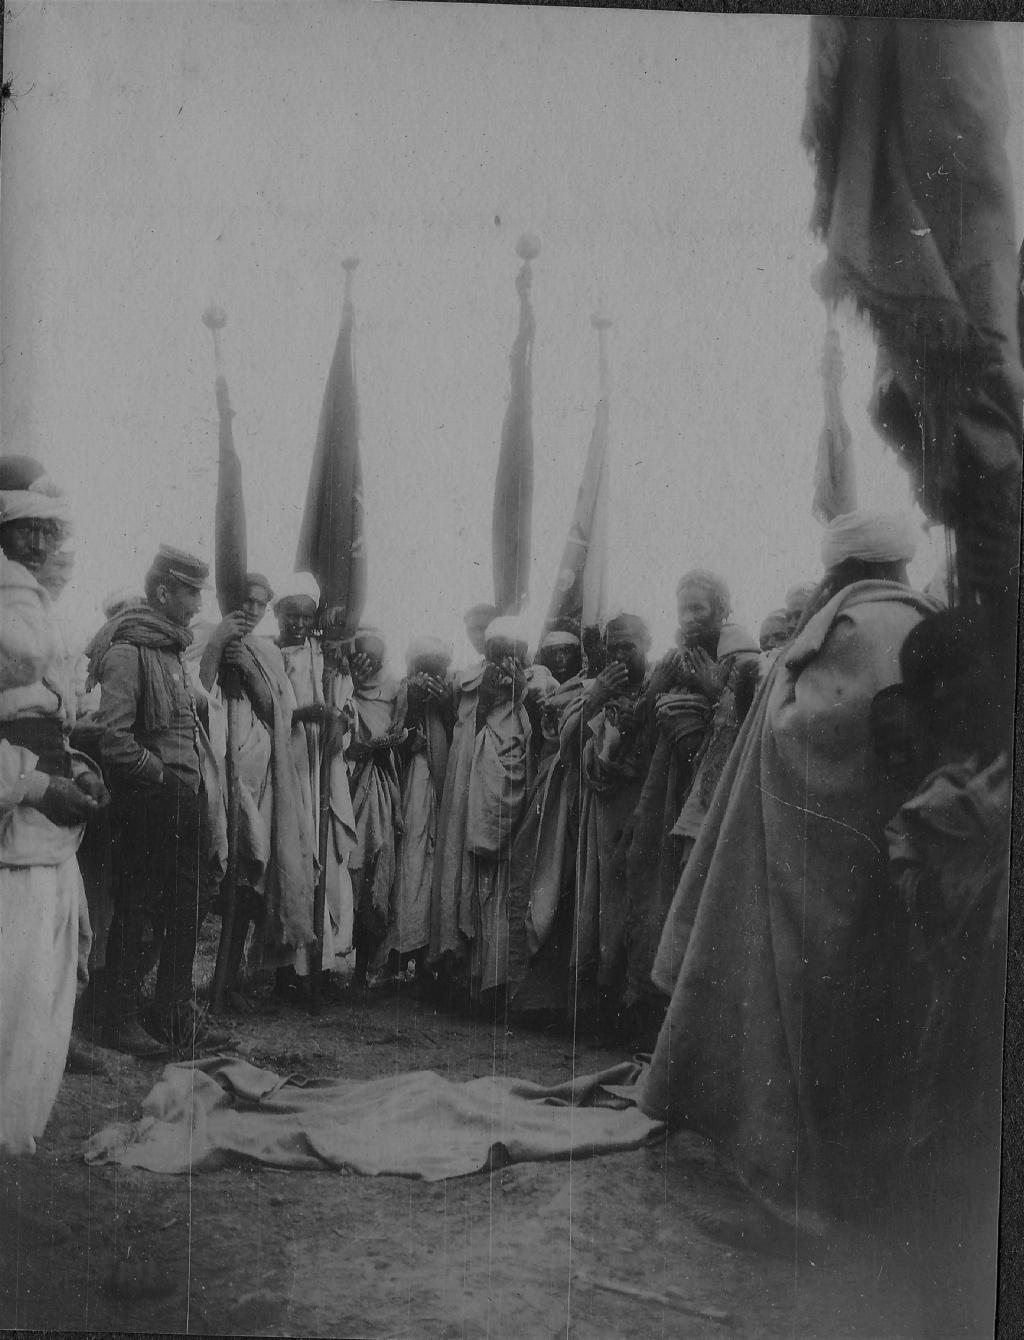 Un groupe franc au Maroc vers 1910-1911 Maroc_12